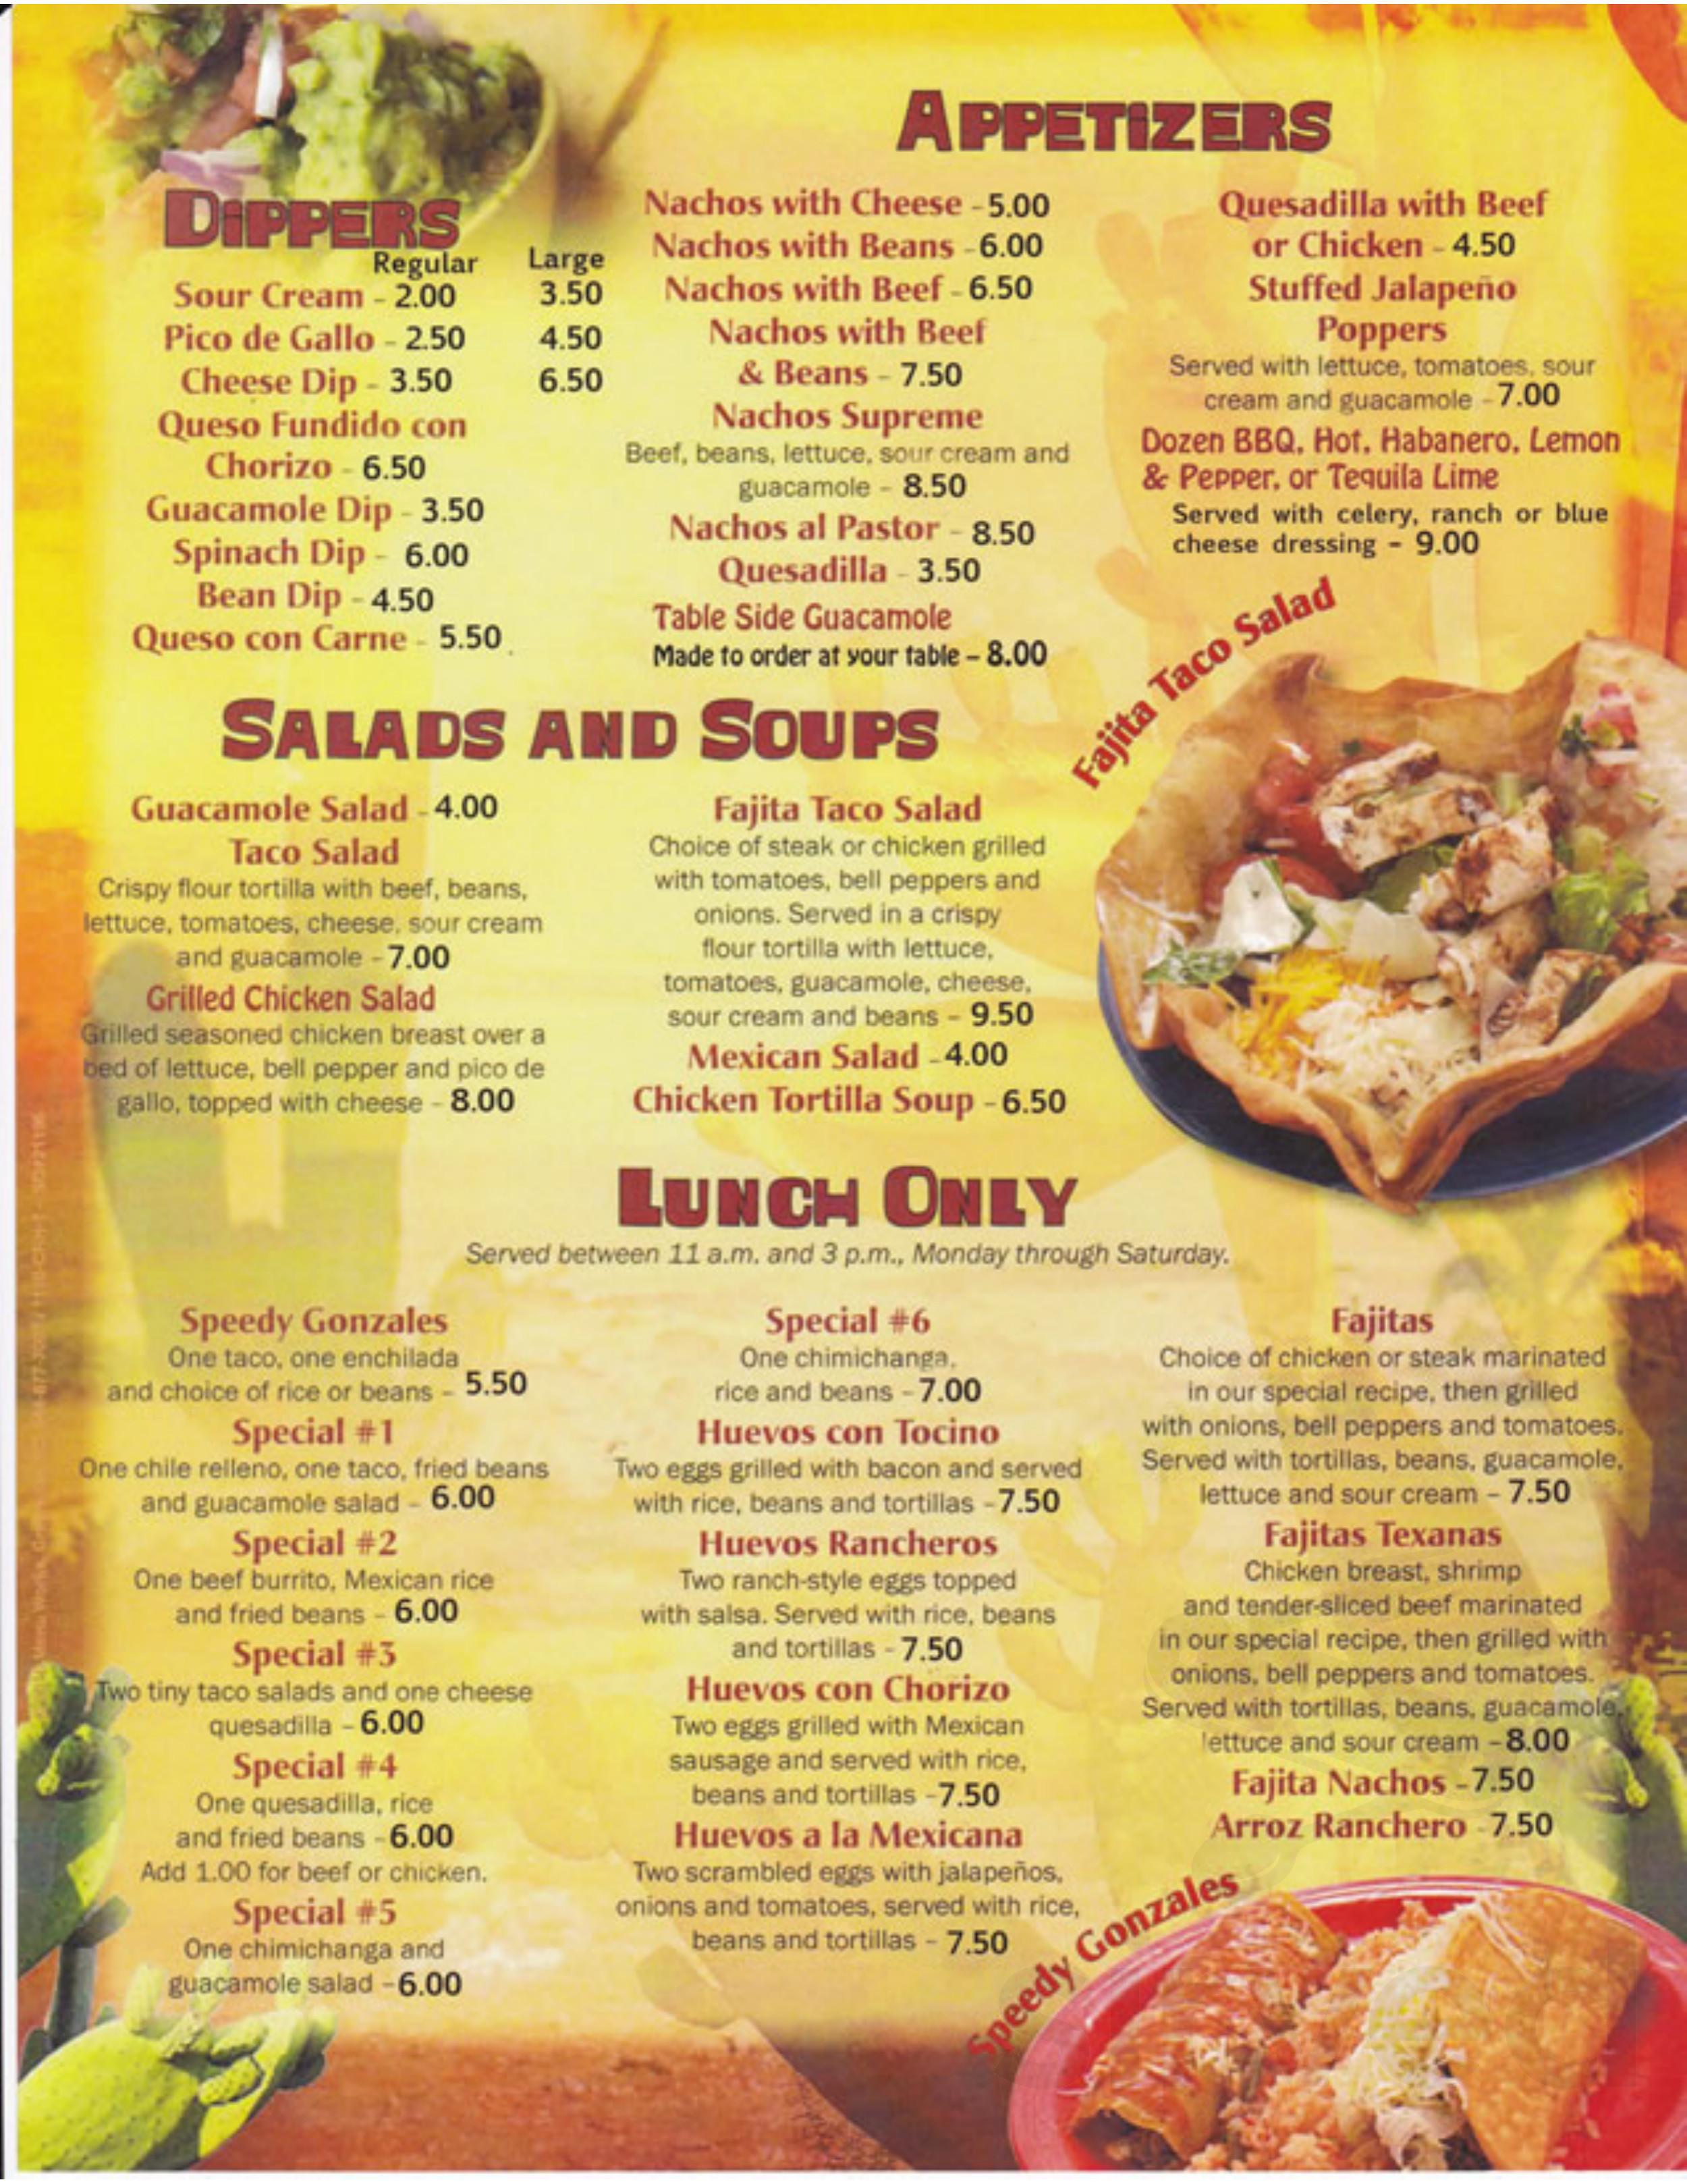 Menu For La Nopalera Mexican Restaurant In Jacksonville Florida